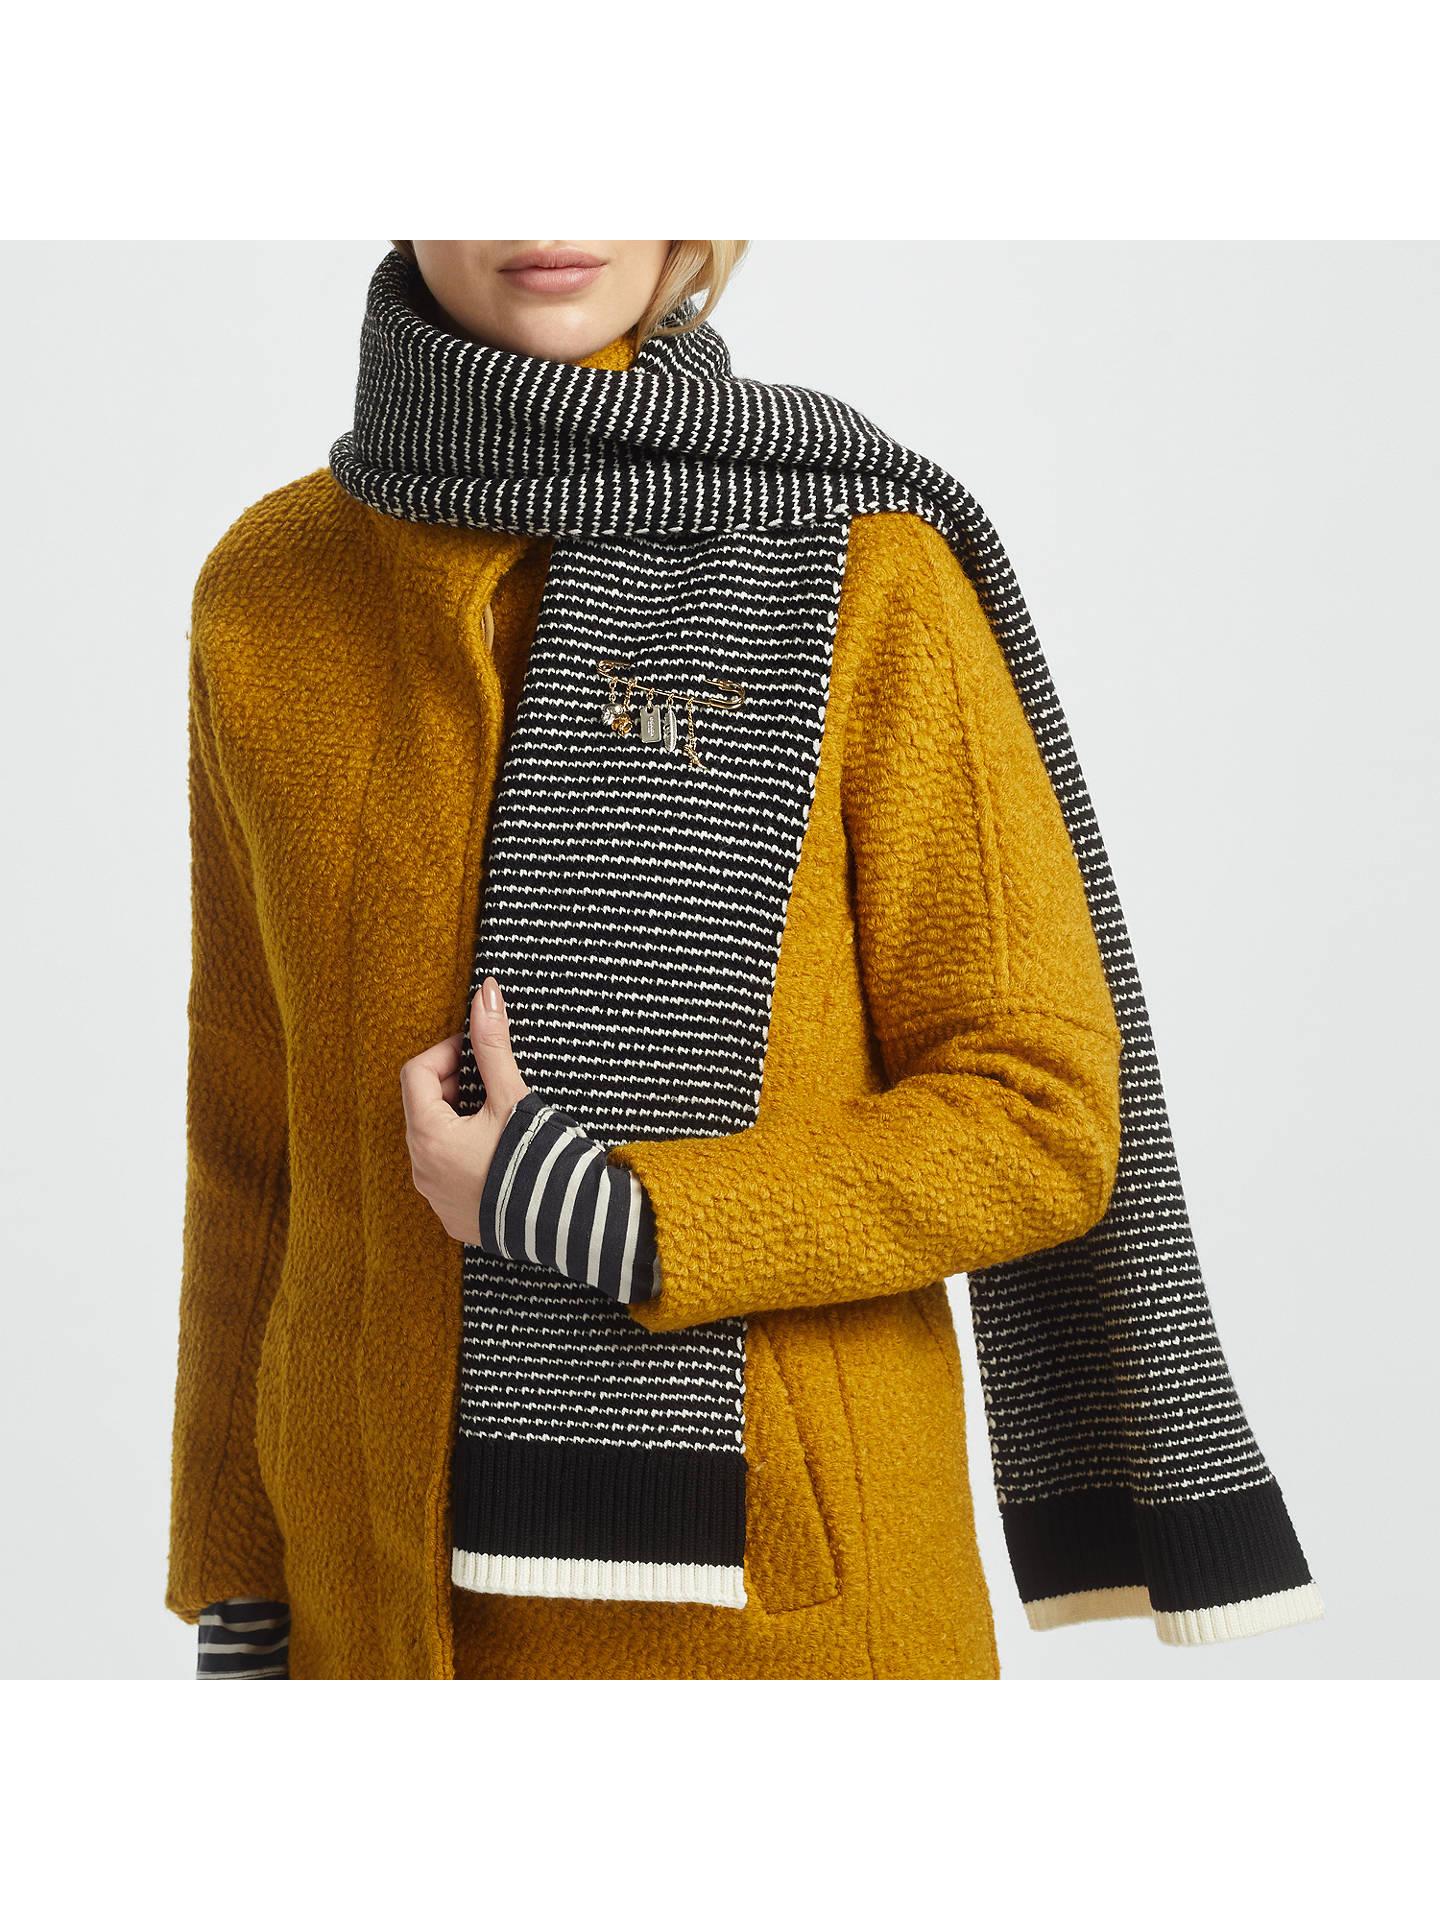 6e53968e692 ... BuyCoach Icon Merino Wool Charm Scarf